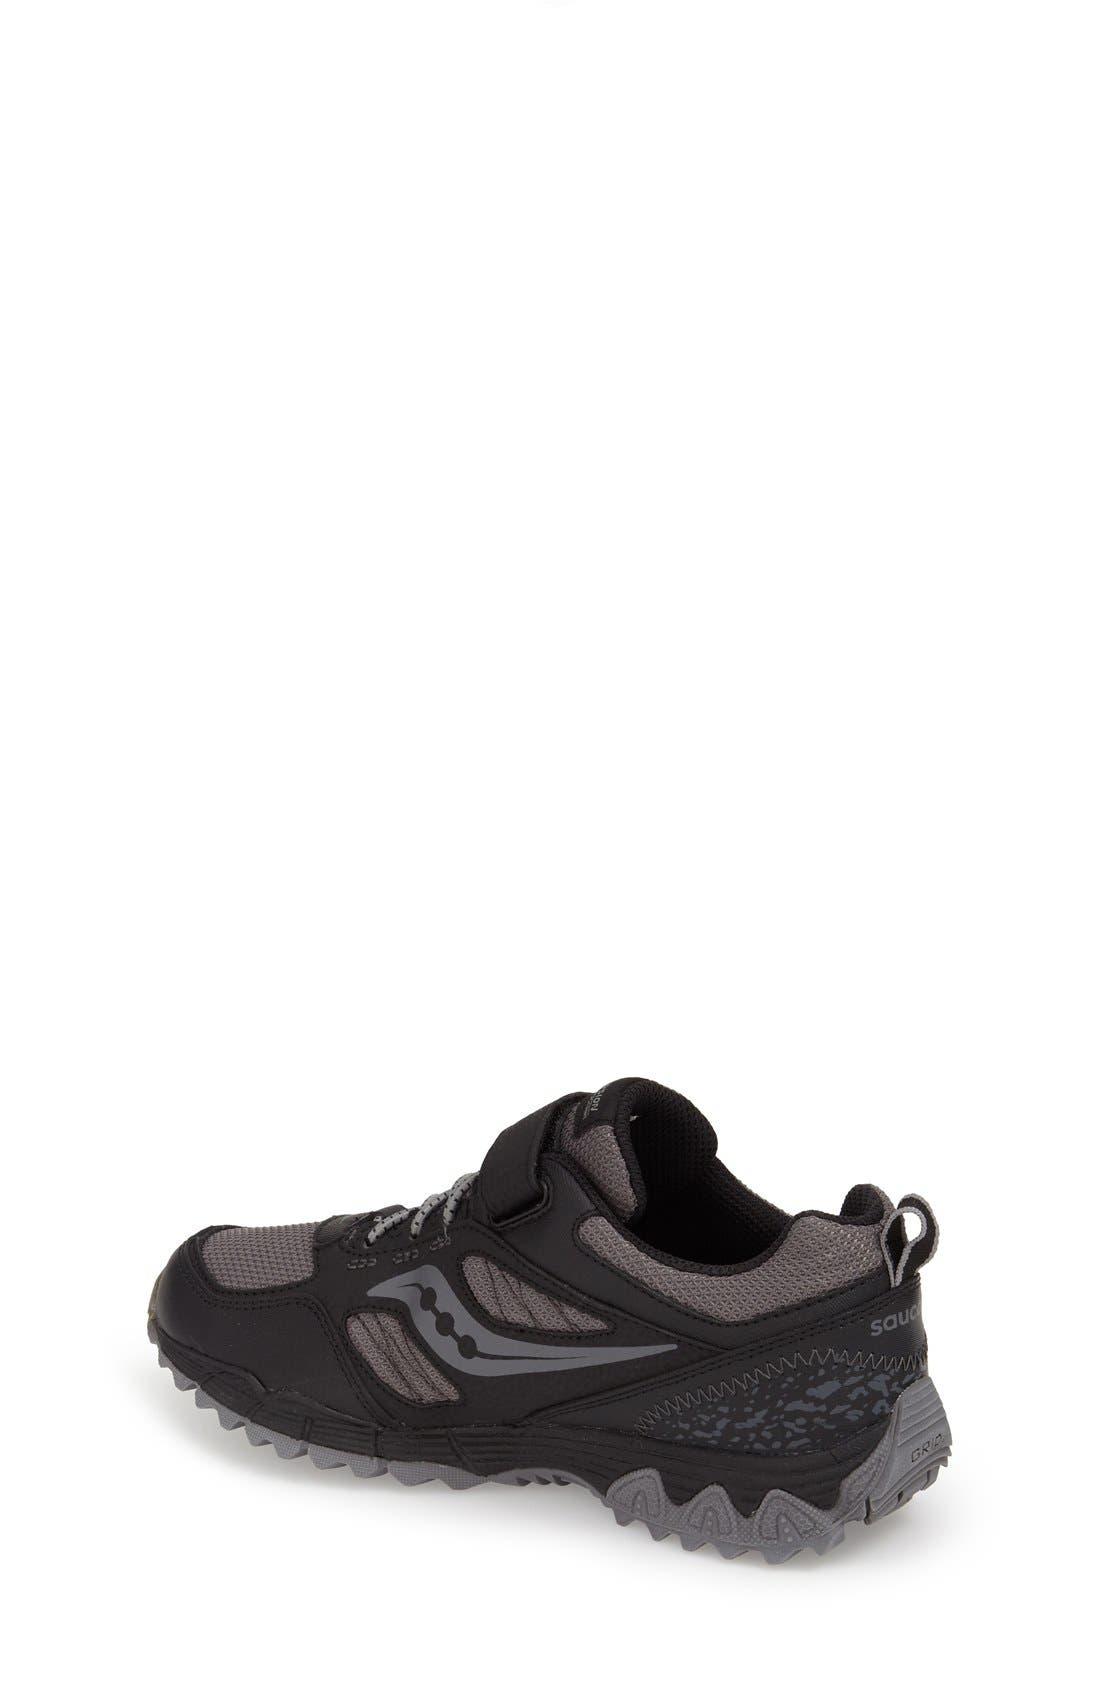 'Excursion Shield' Water Resistant Trail Shoe,                             Alternate thumbnail 6, color,                             001